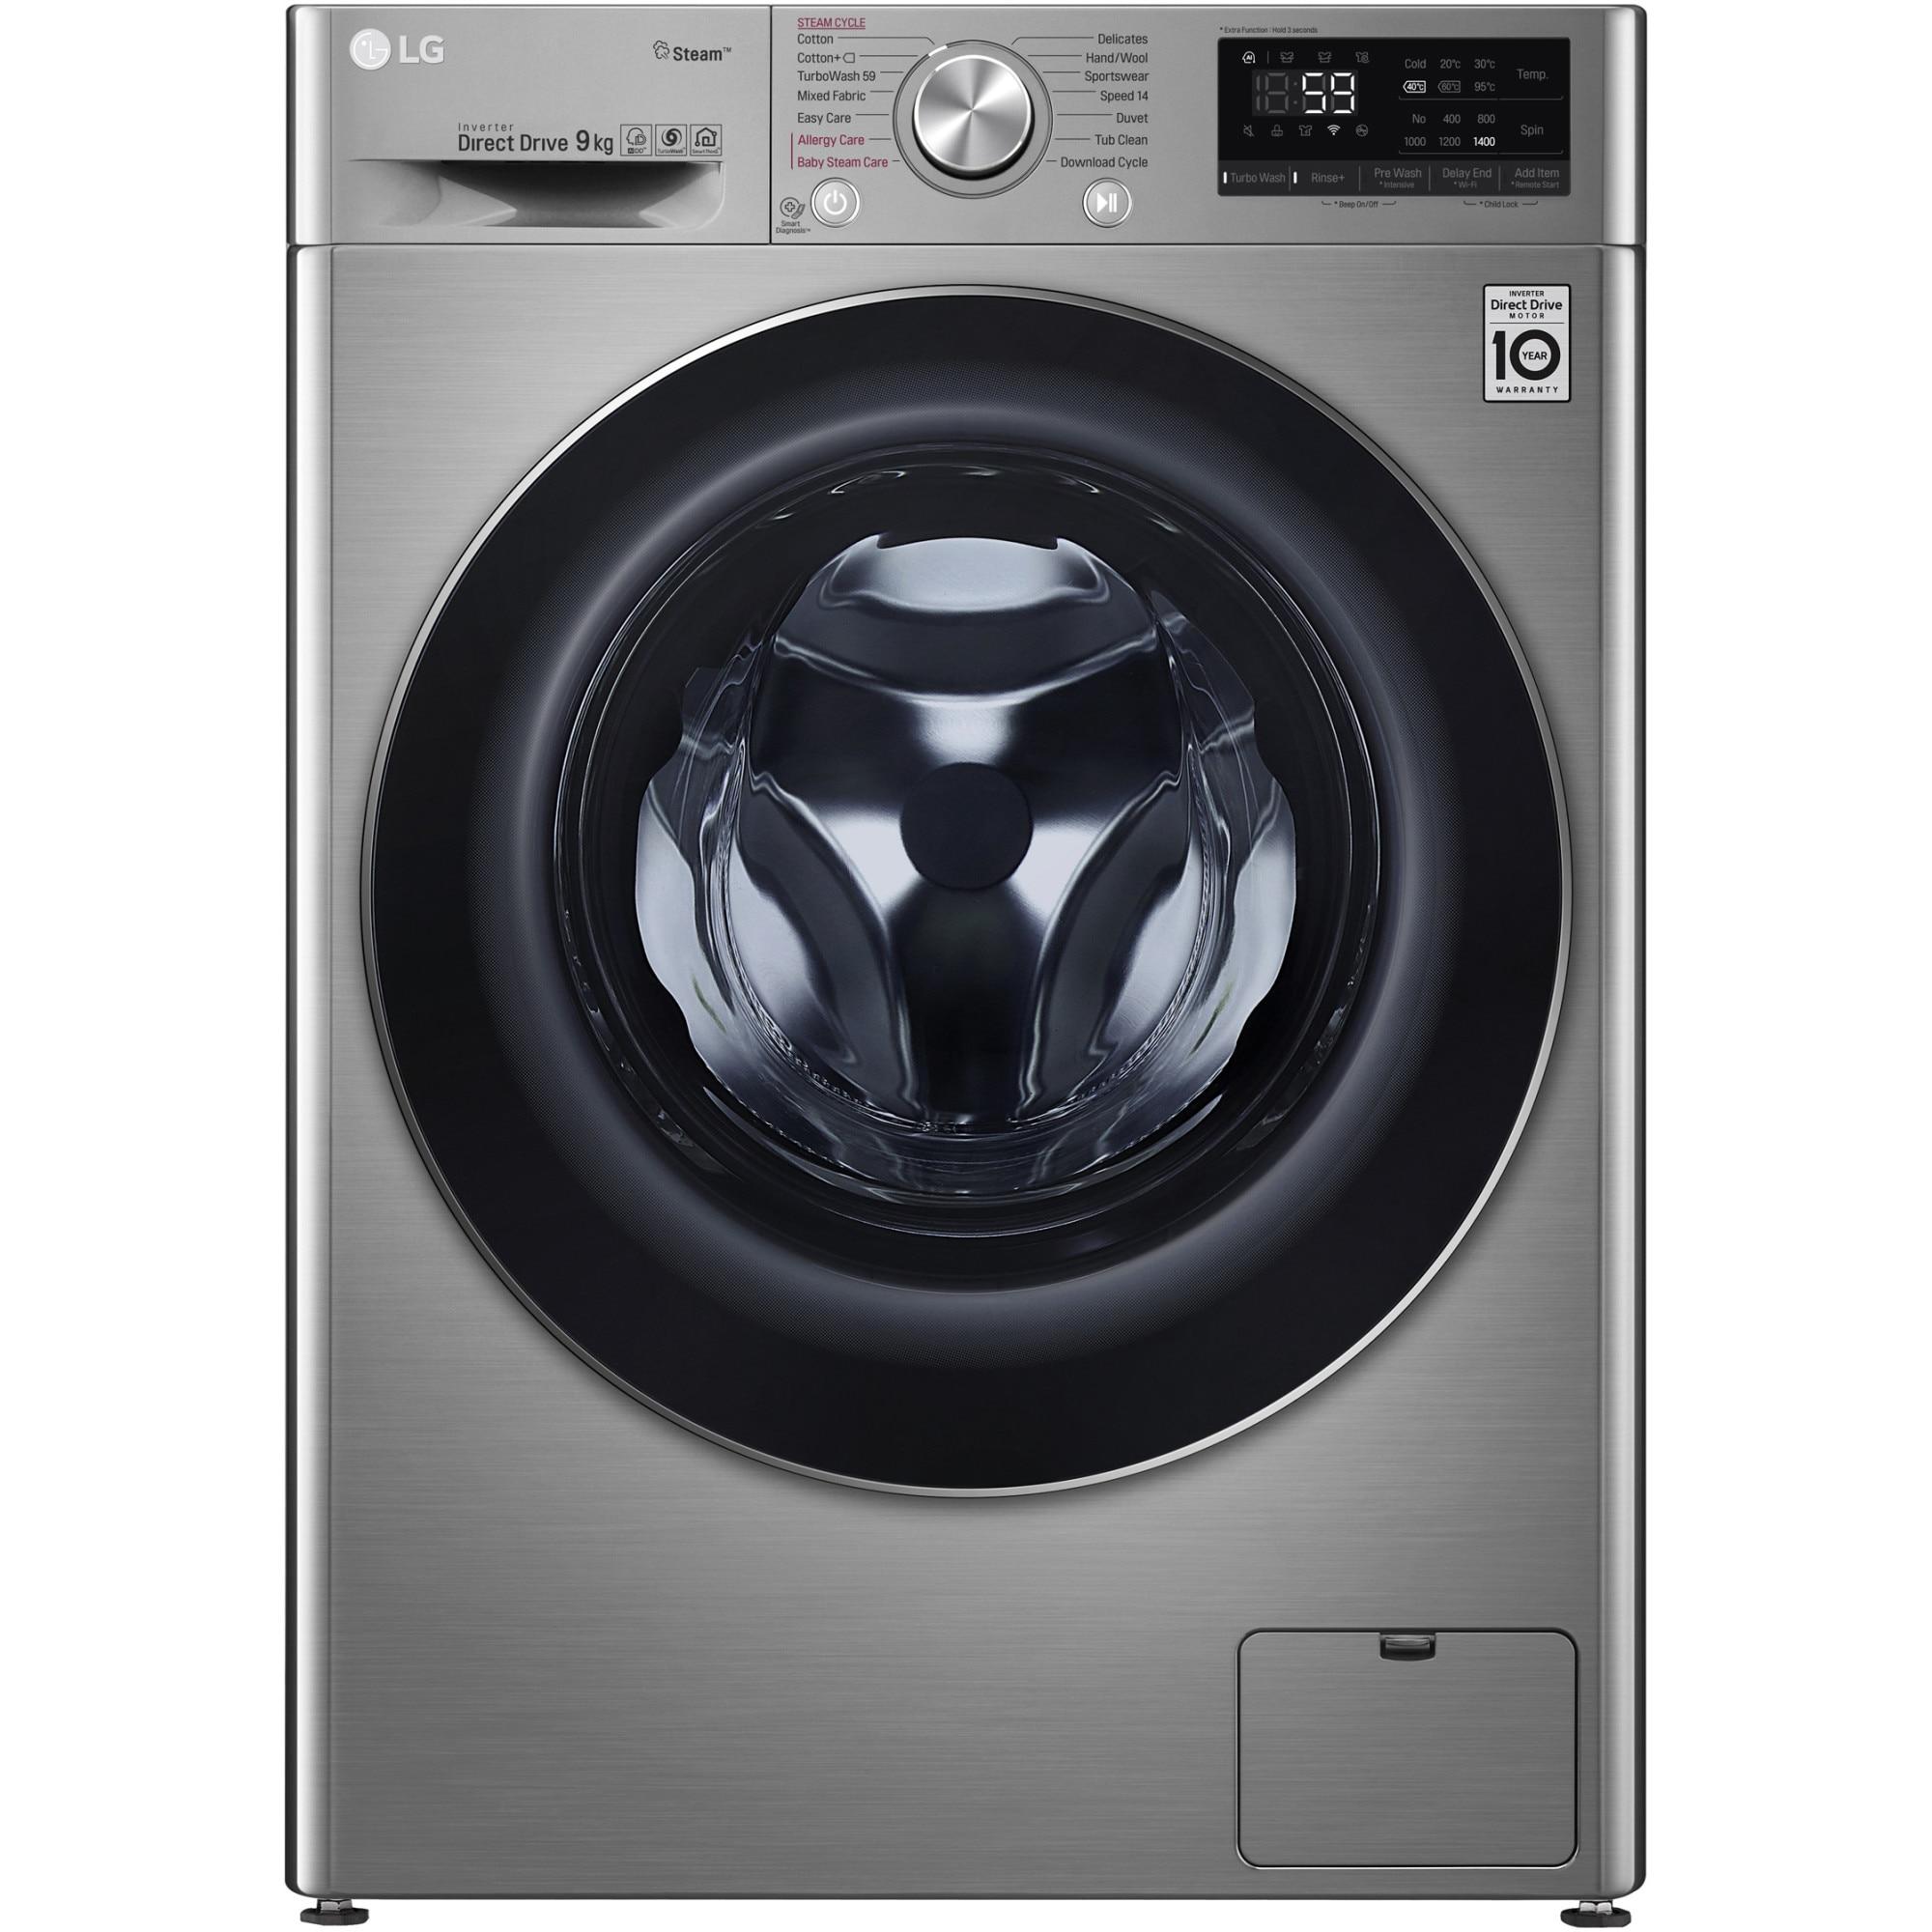 Fotografie Masina de spalat rufe LG F4WN609S2T, 9 kg, 1400 RPM, Clasa A+++, Direct Drive, Turbo Wash, Steam, Smart Diagnoisis, WiFi, Argintiu